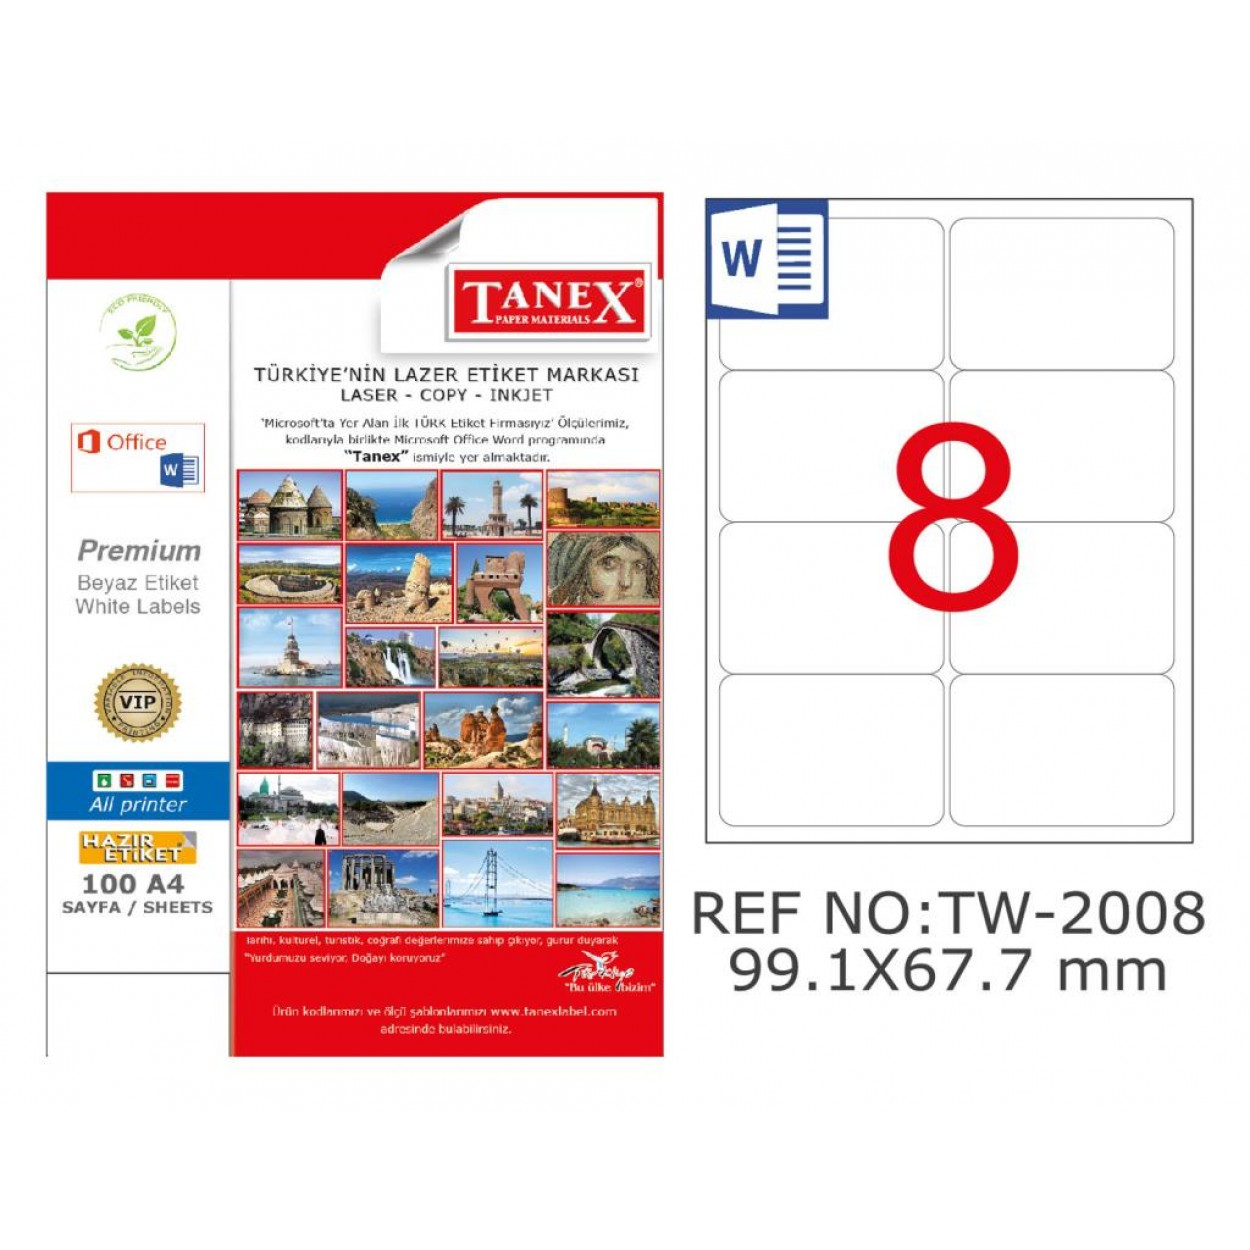 Tanex TW-2008 99,1x67,7 mm Kuşe Laser Etiket